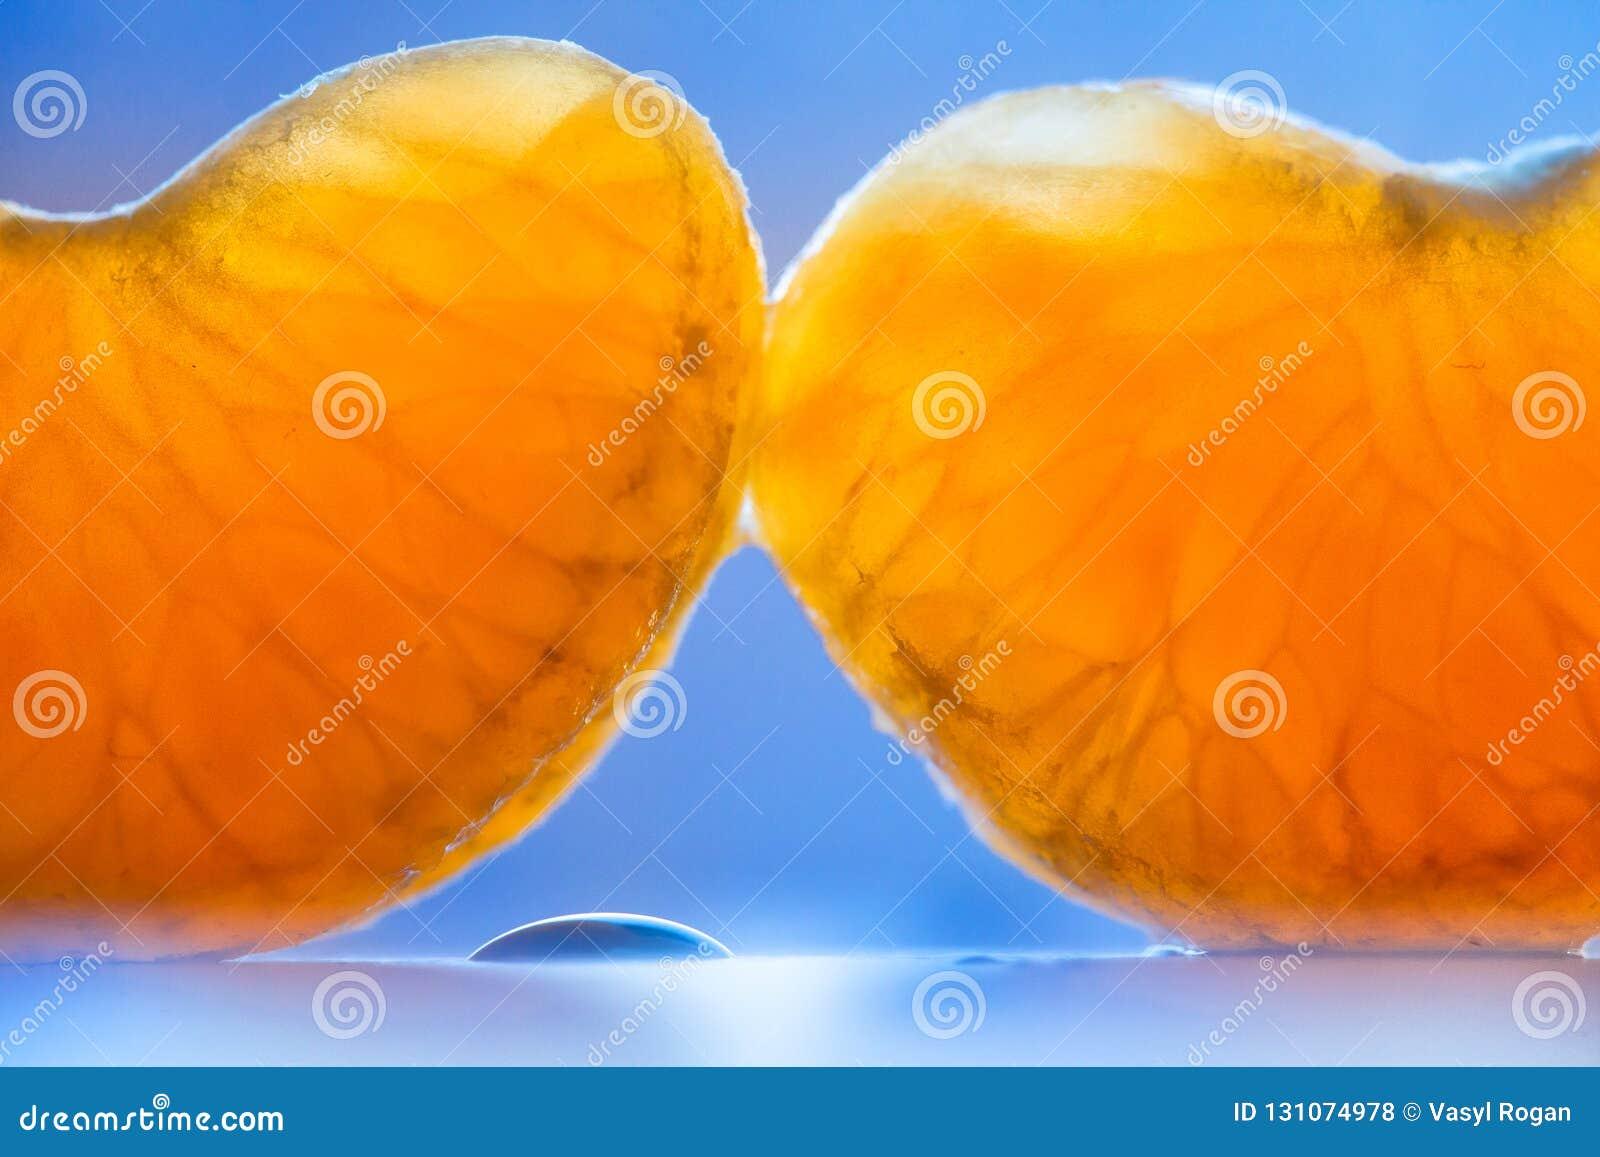 Clavos dulces maduros de la mandarina Segmento anaranjado dos en fondo azul